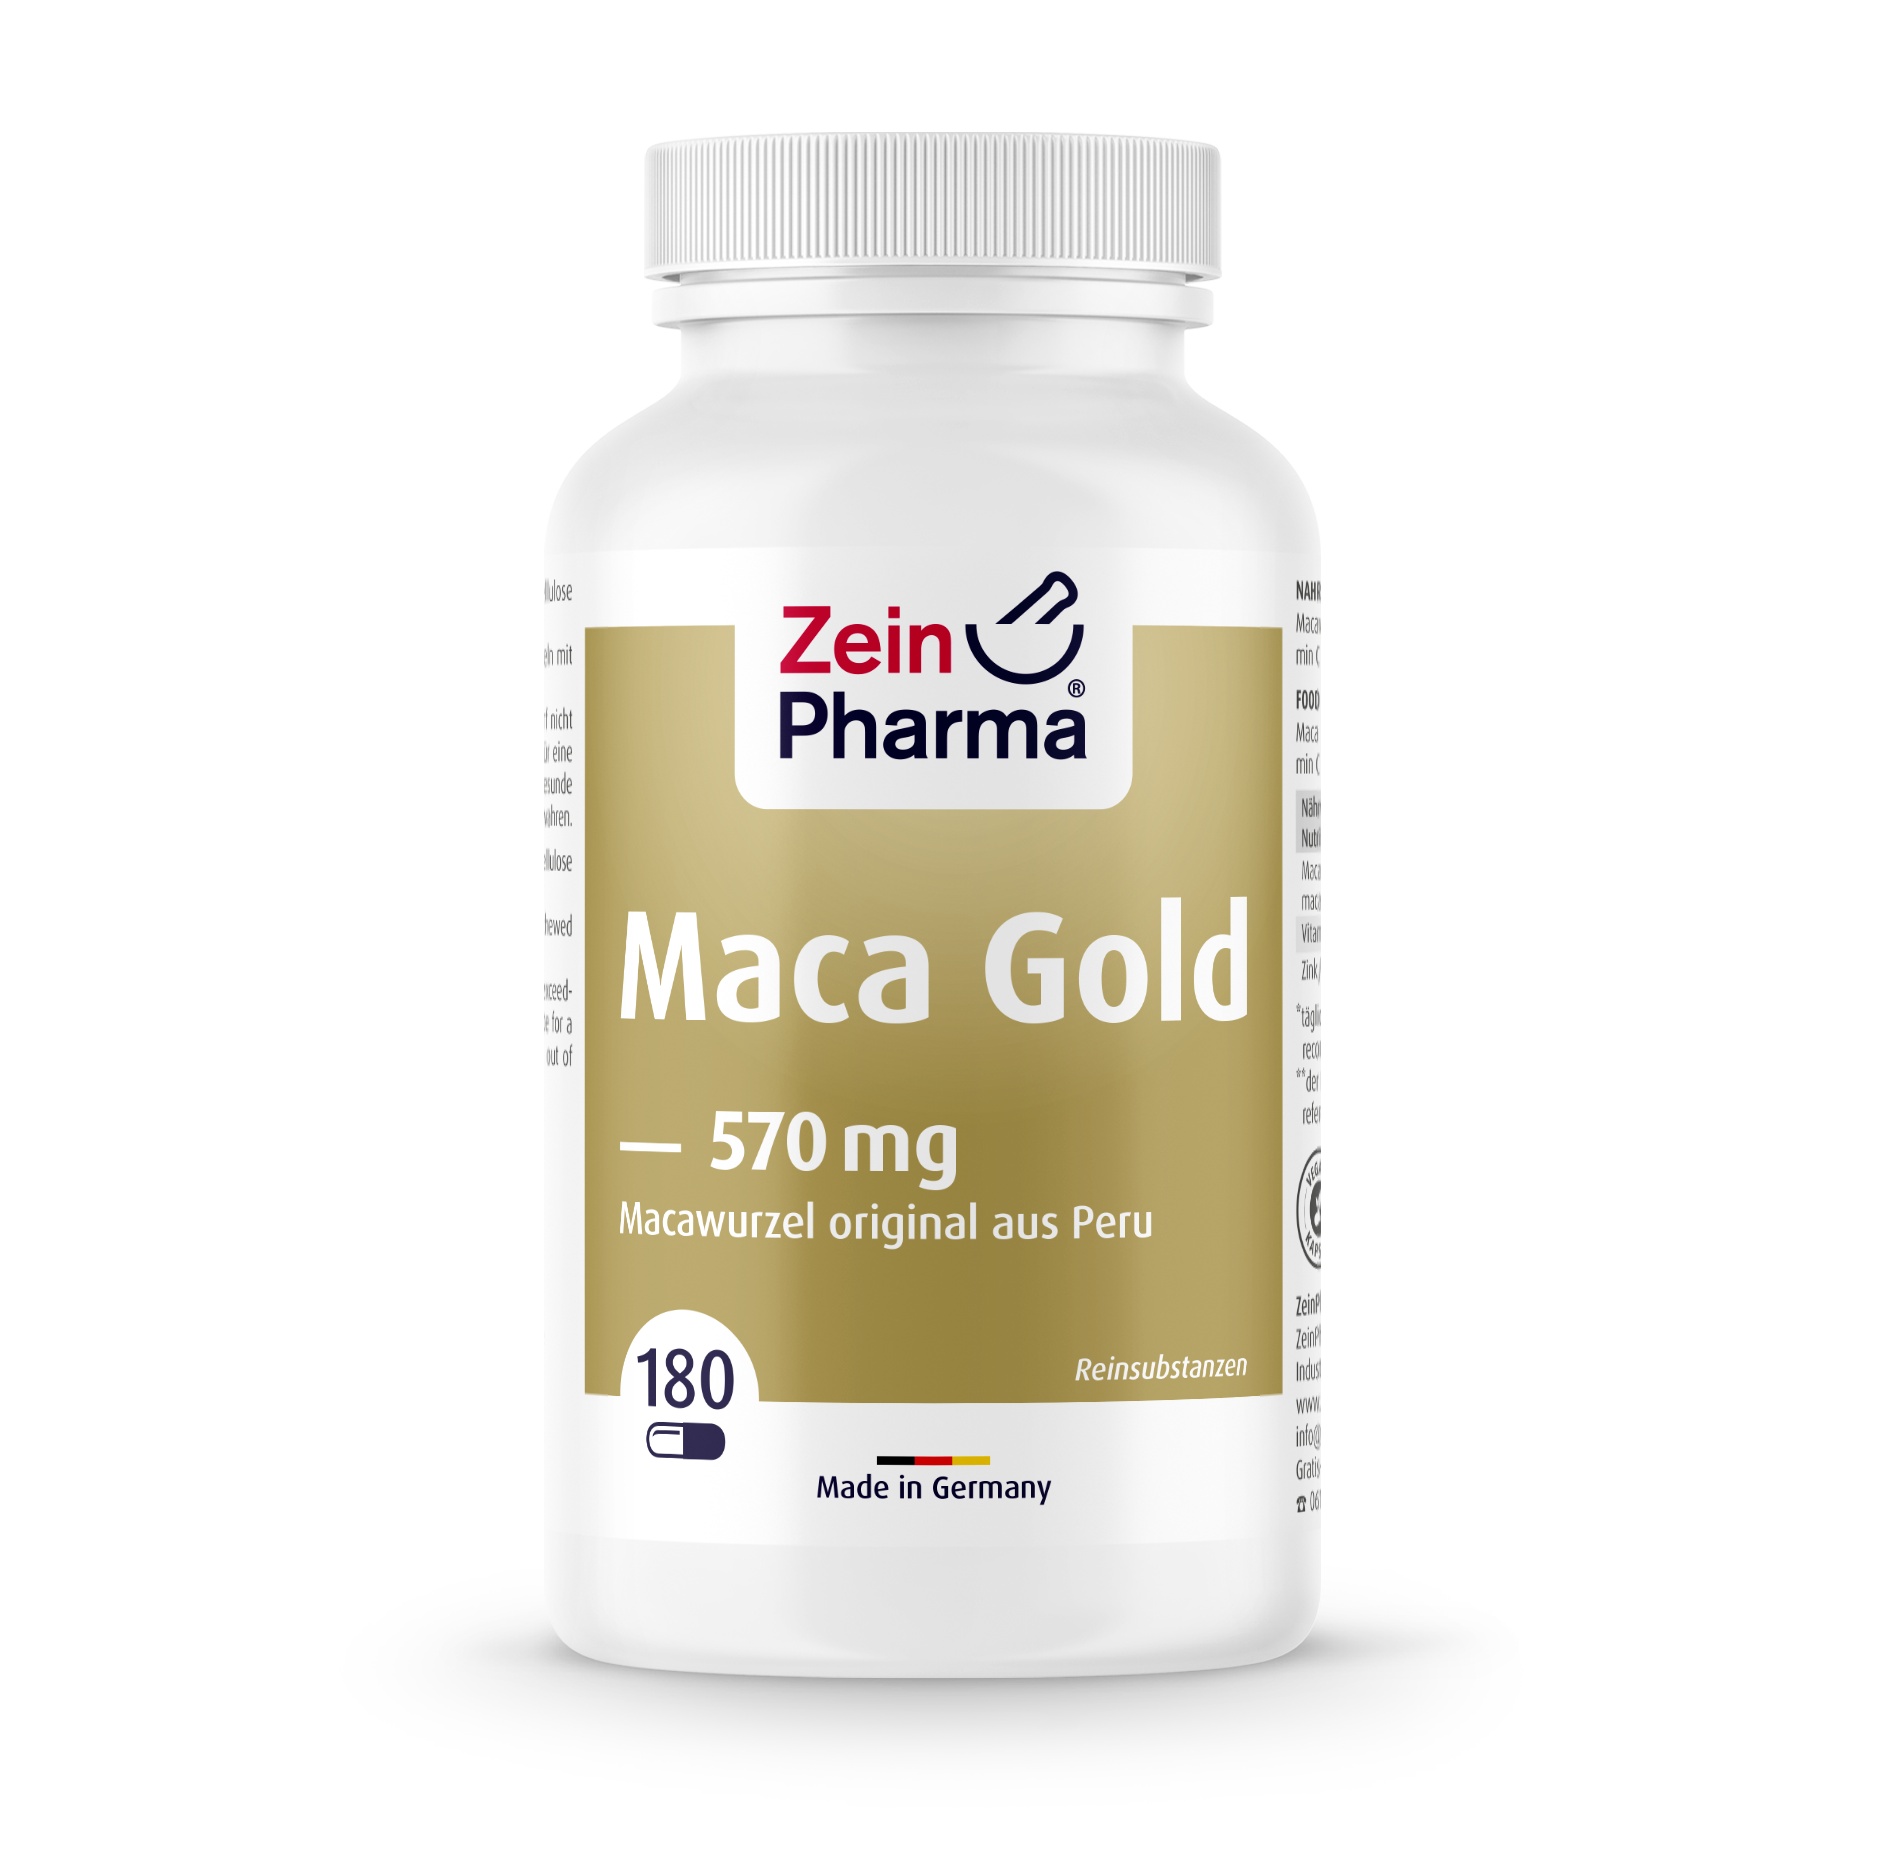 Maca Gold Kapseln